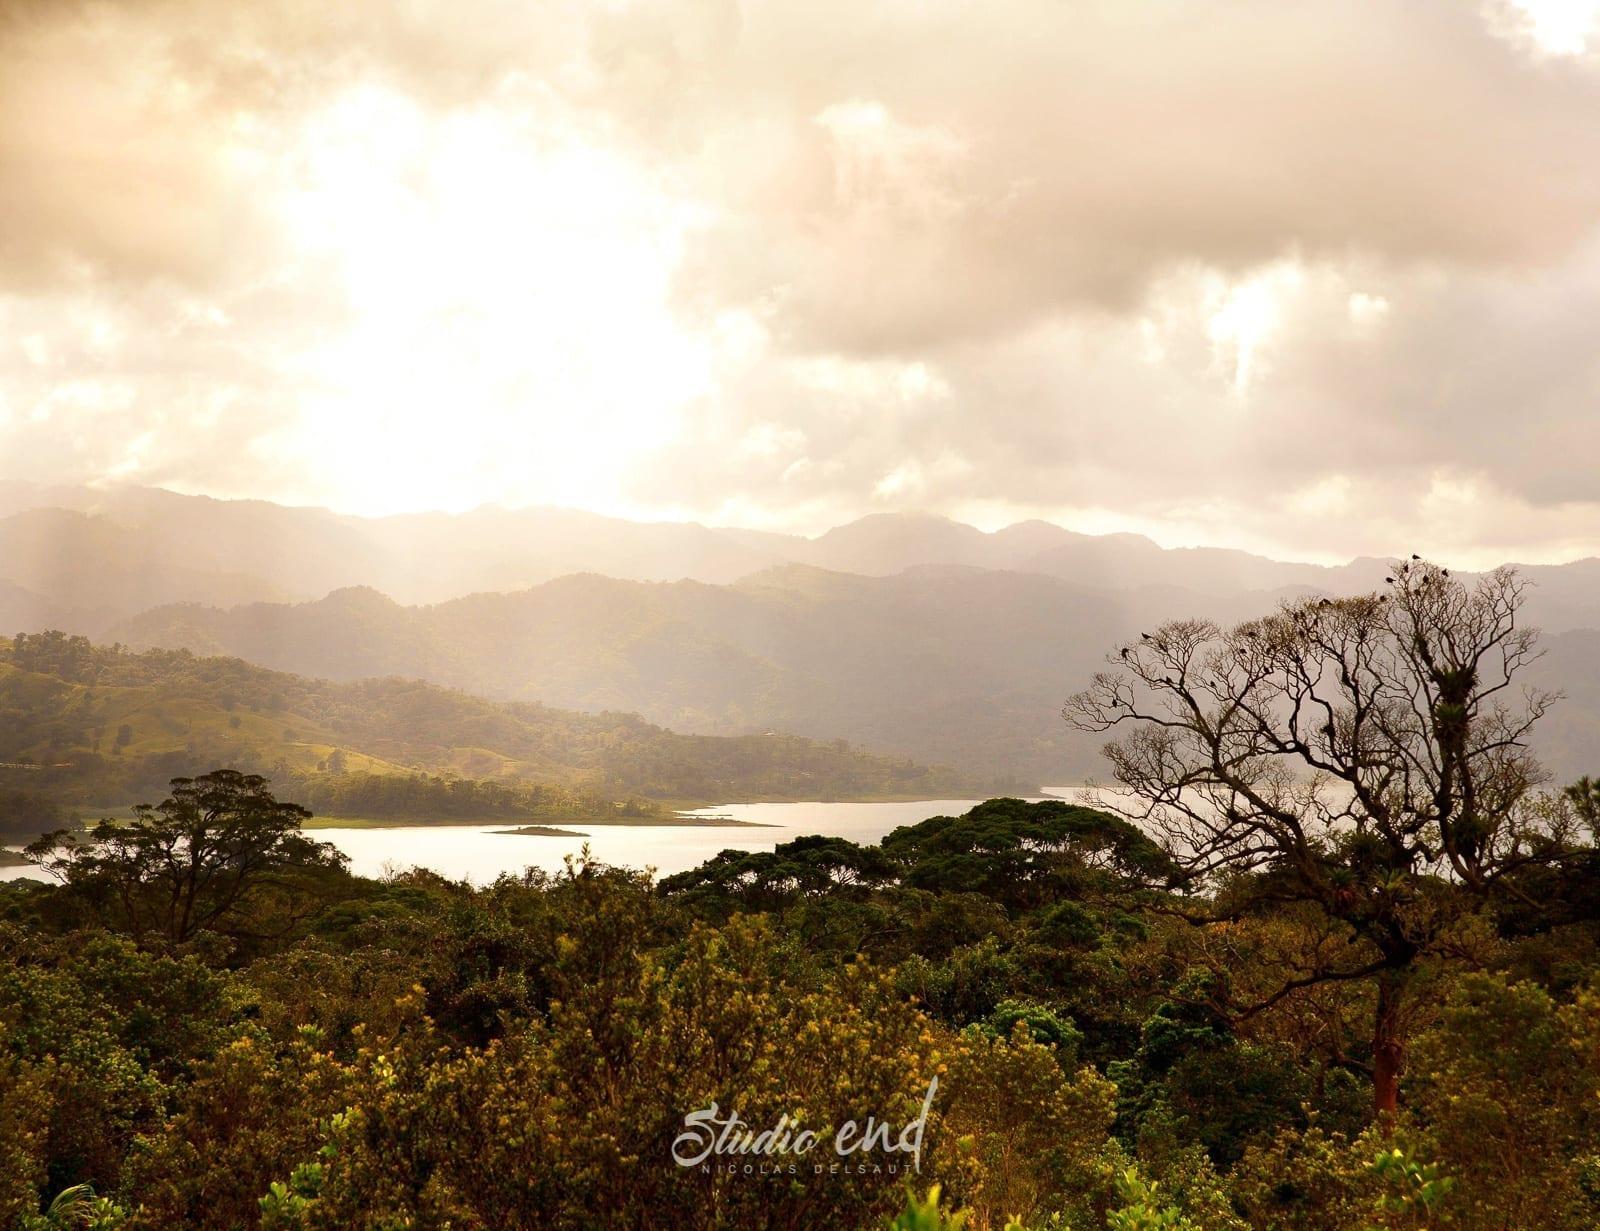 Photographie et reportage de voyage vue tropicale Costa Rica Nicolas Delsaut